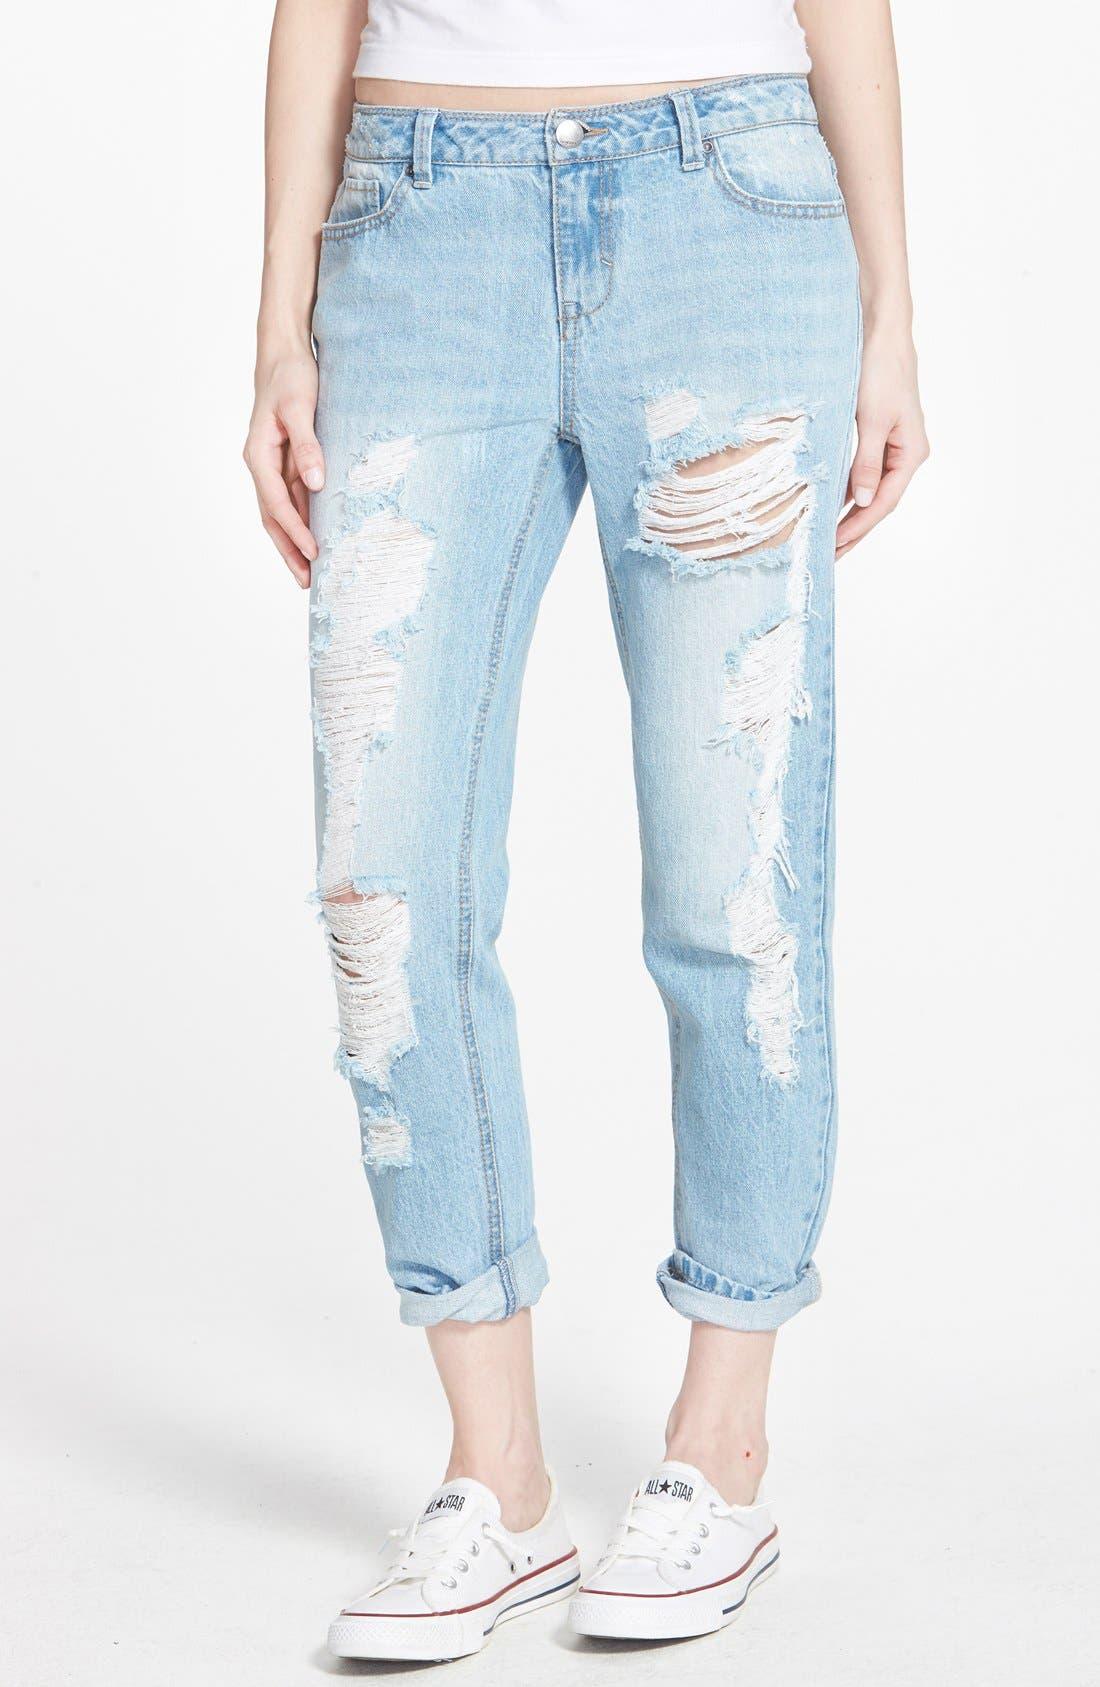 Alternate Image 1 Selected - Generra Boyfriend Jeans (Blue)